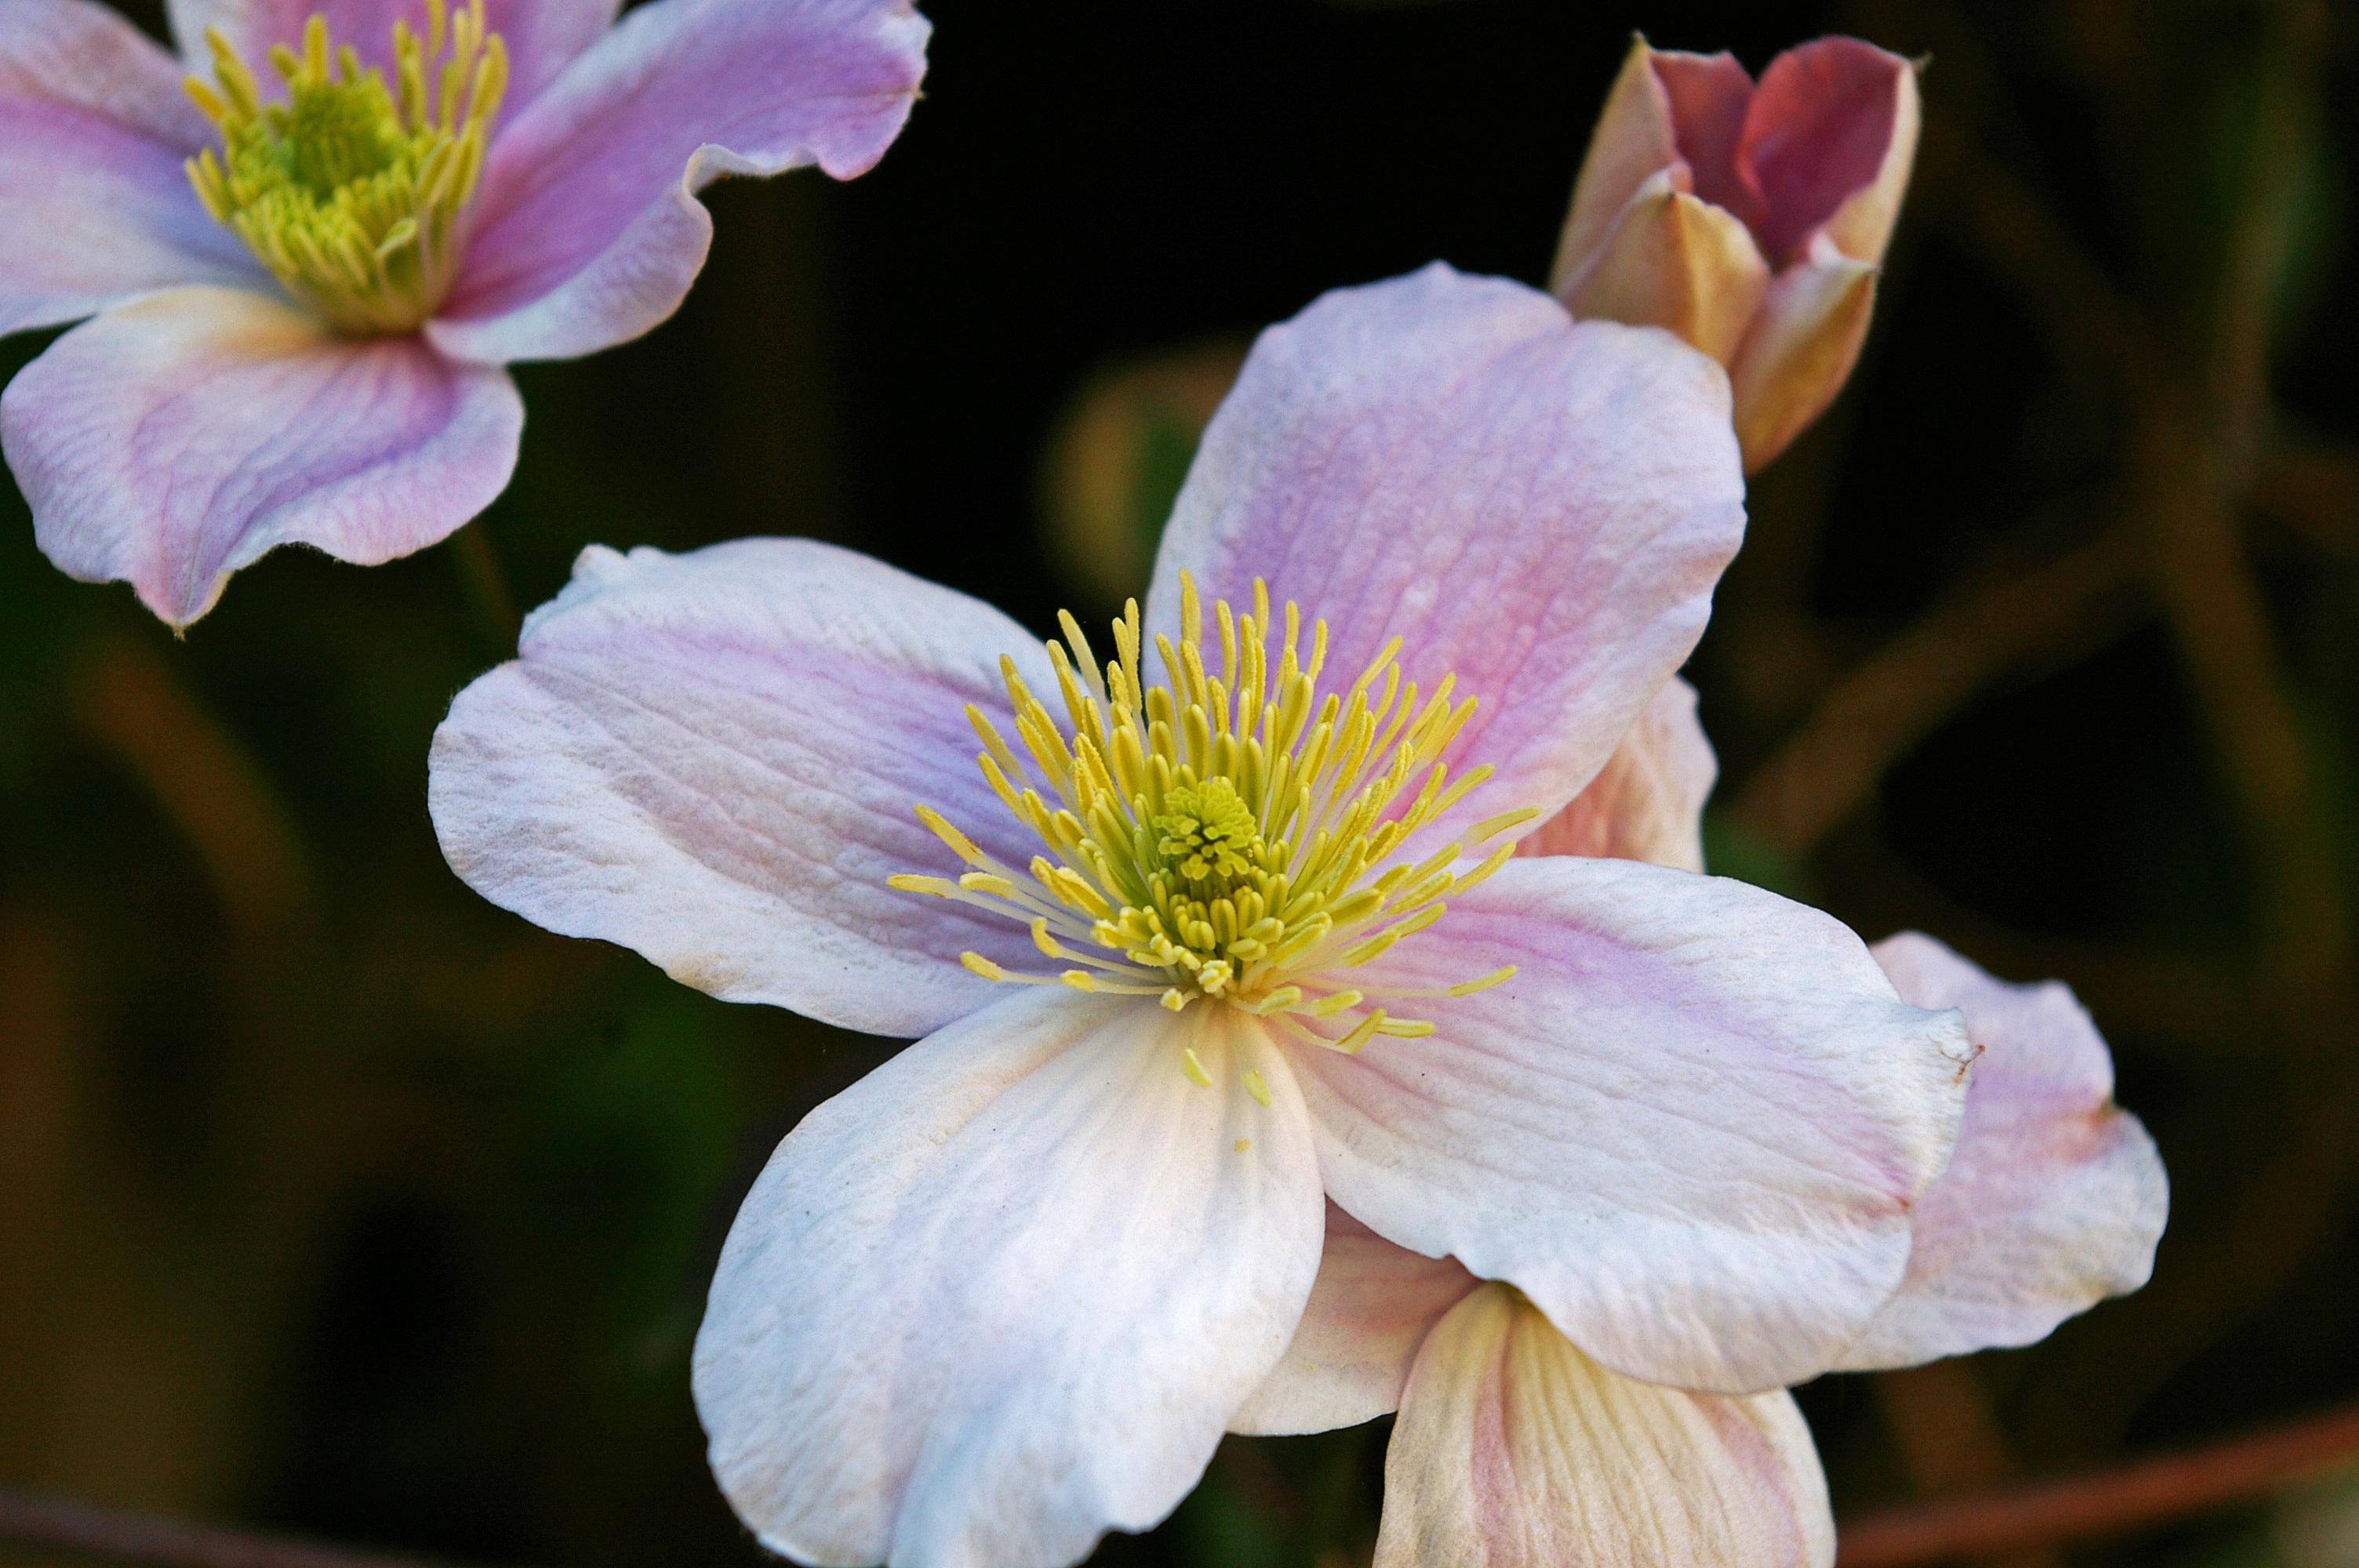 Free Images Nature Blossom Sweet Flower Petal Bloom Botany